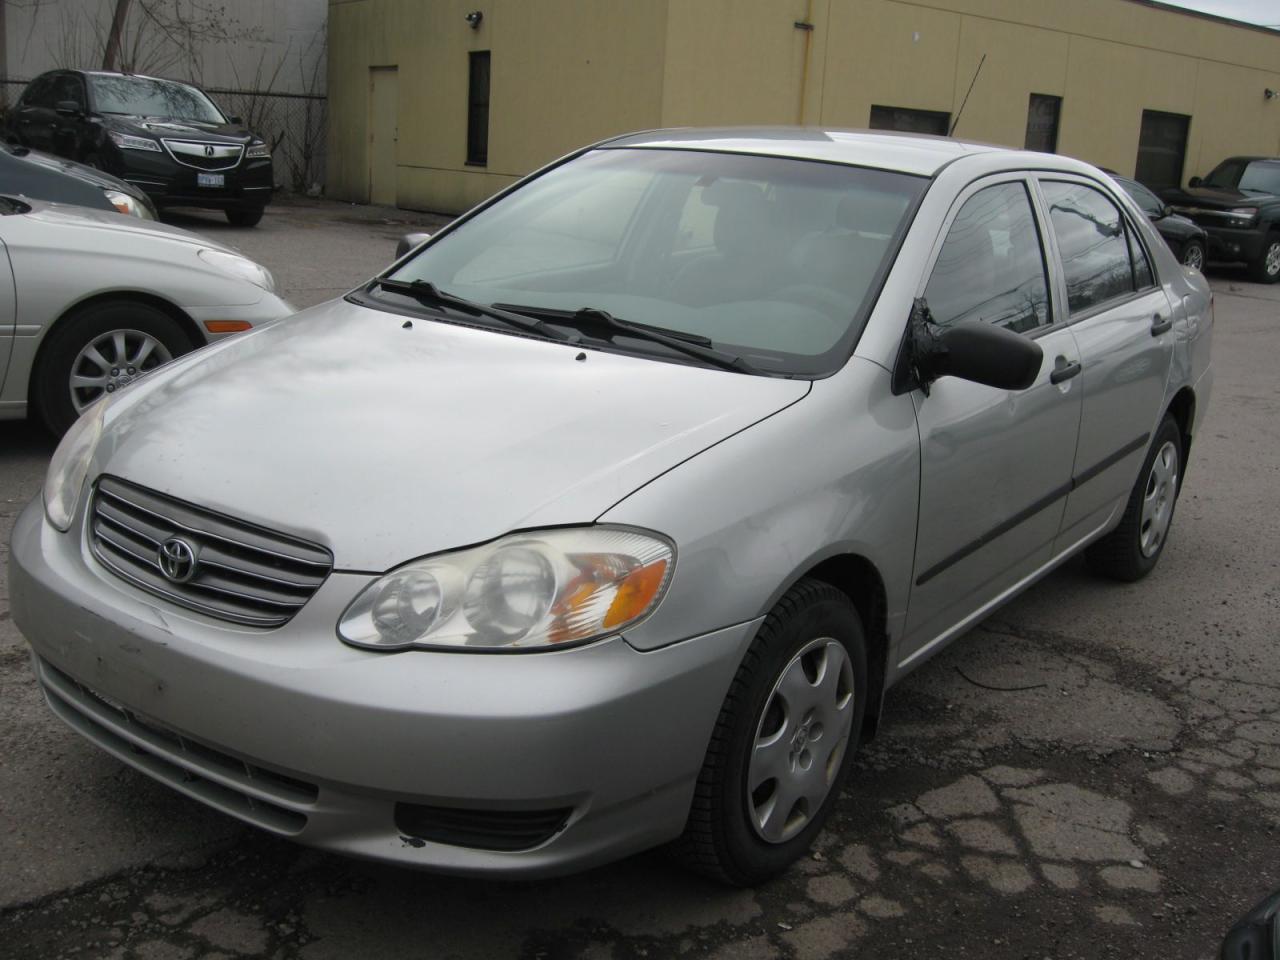 Photo of Silver 2003 Toyota Corolla